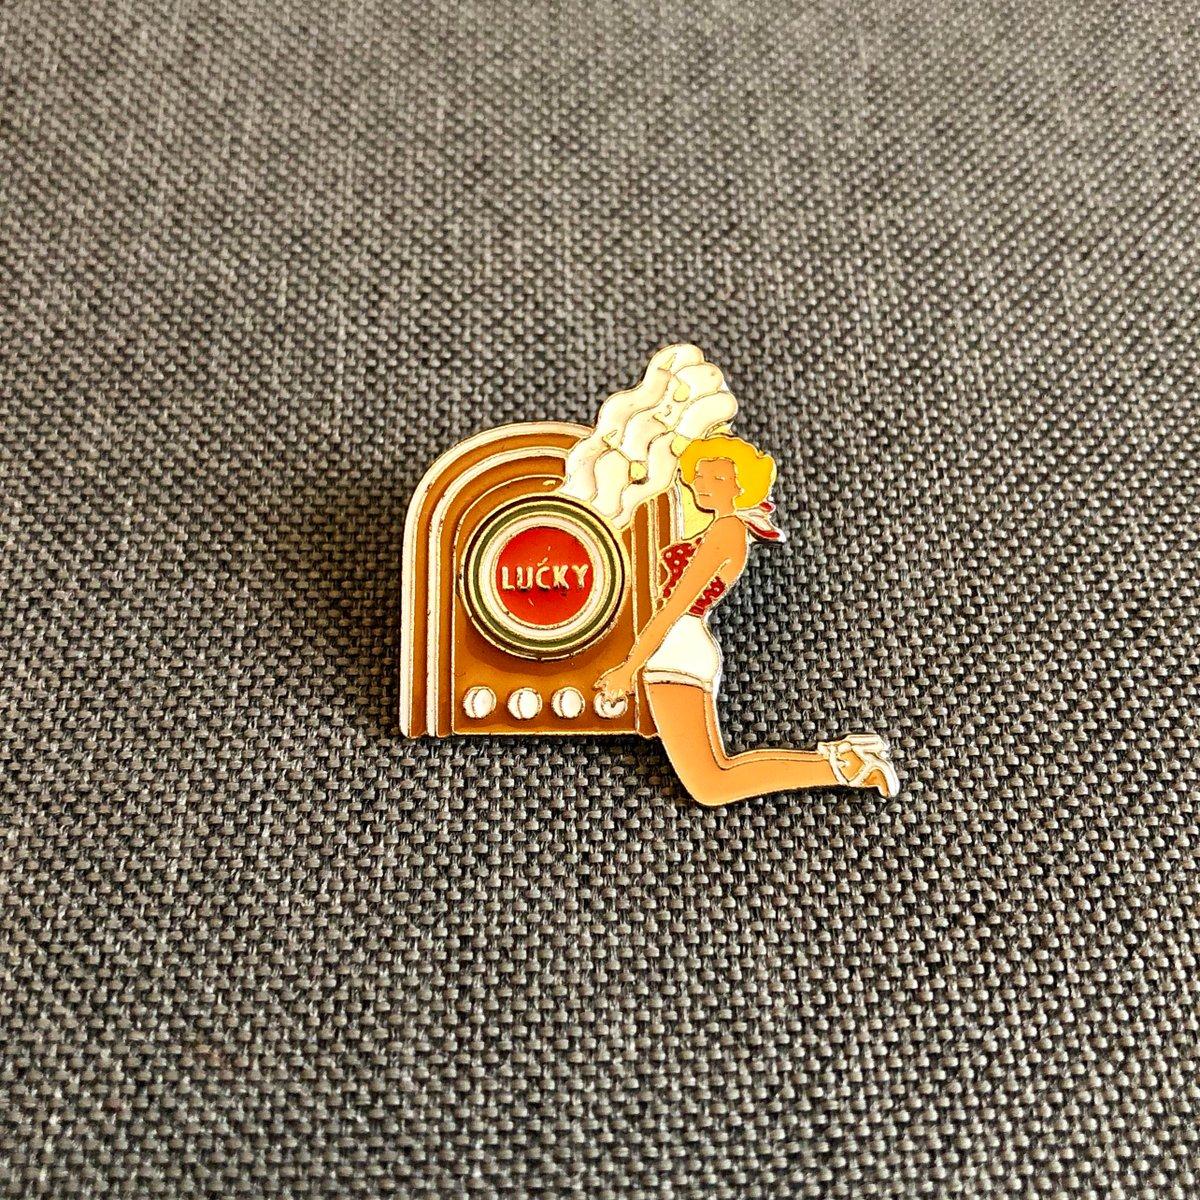 vintagepins Genuine Vintage Enamel Pins - Worldwide shipping